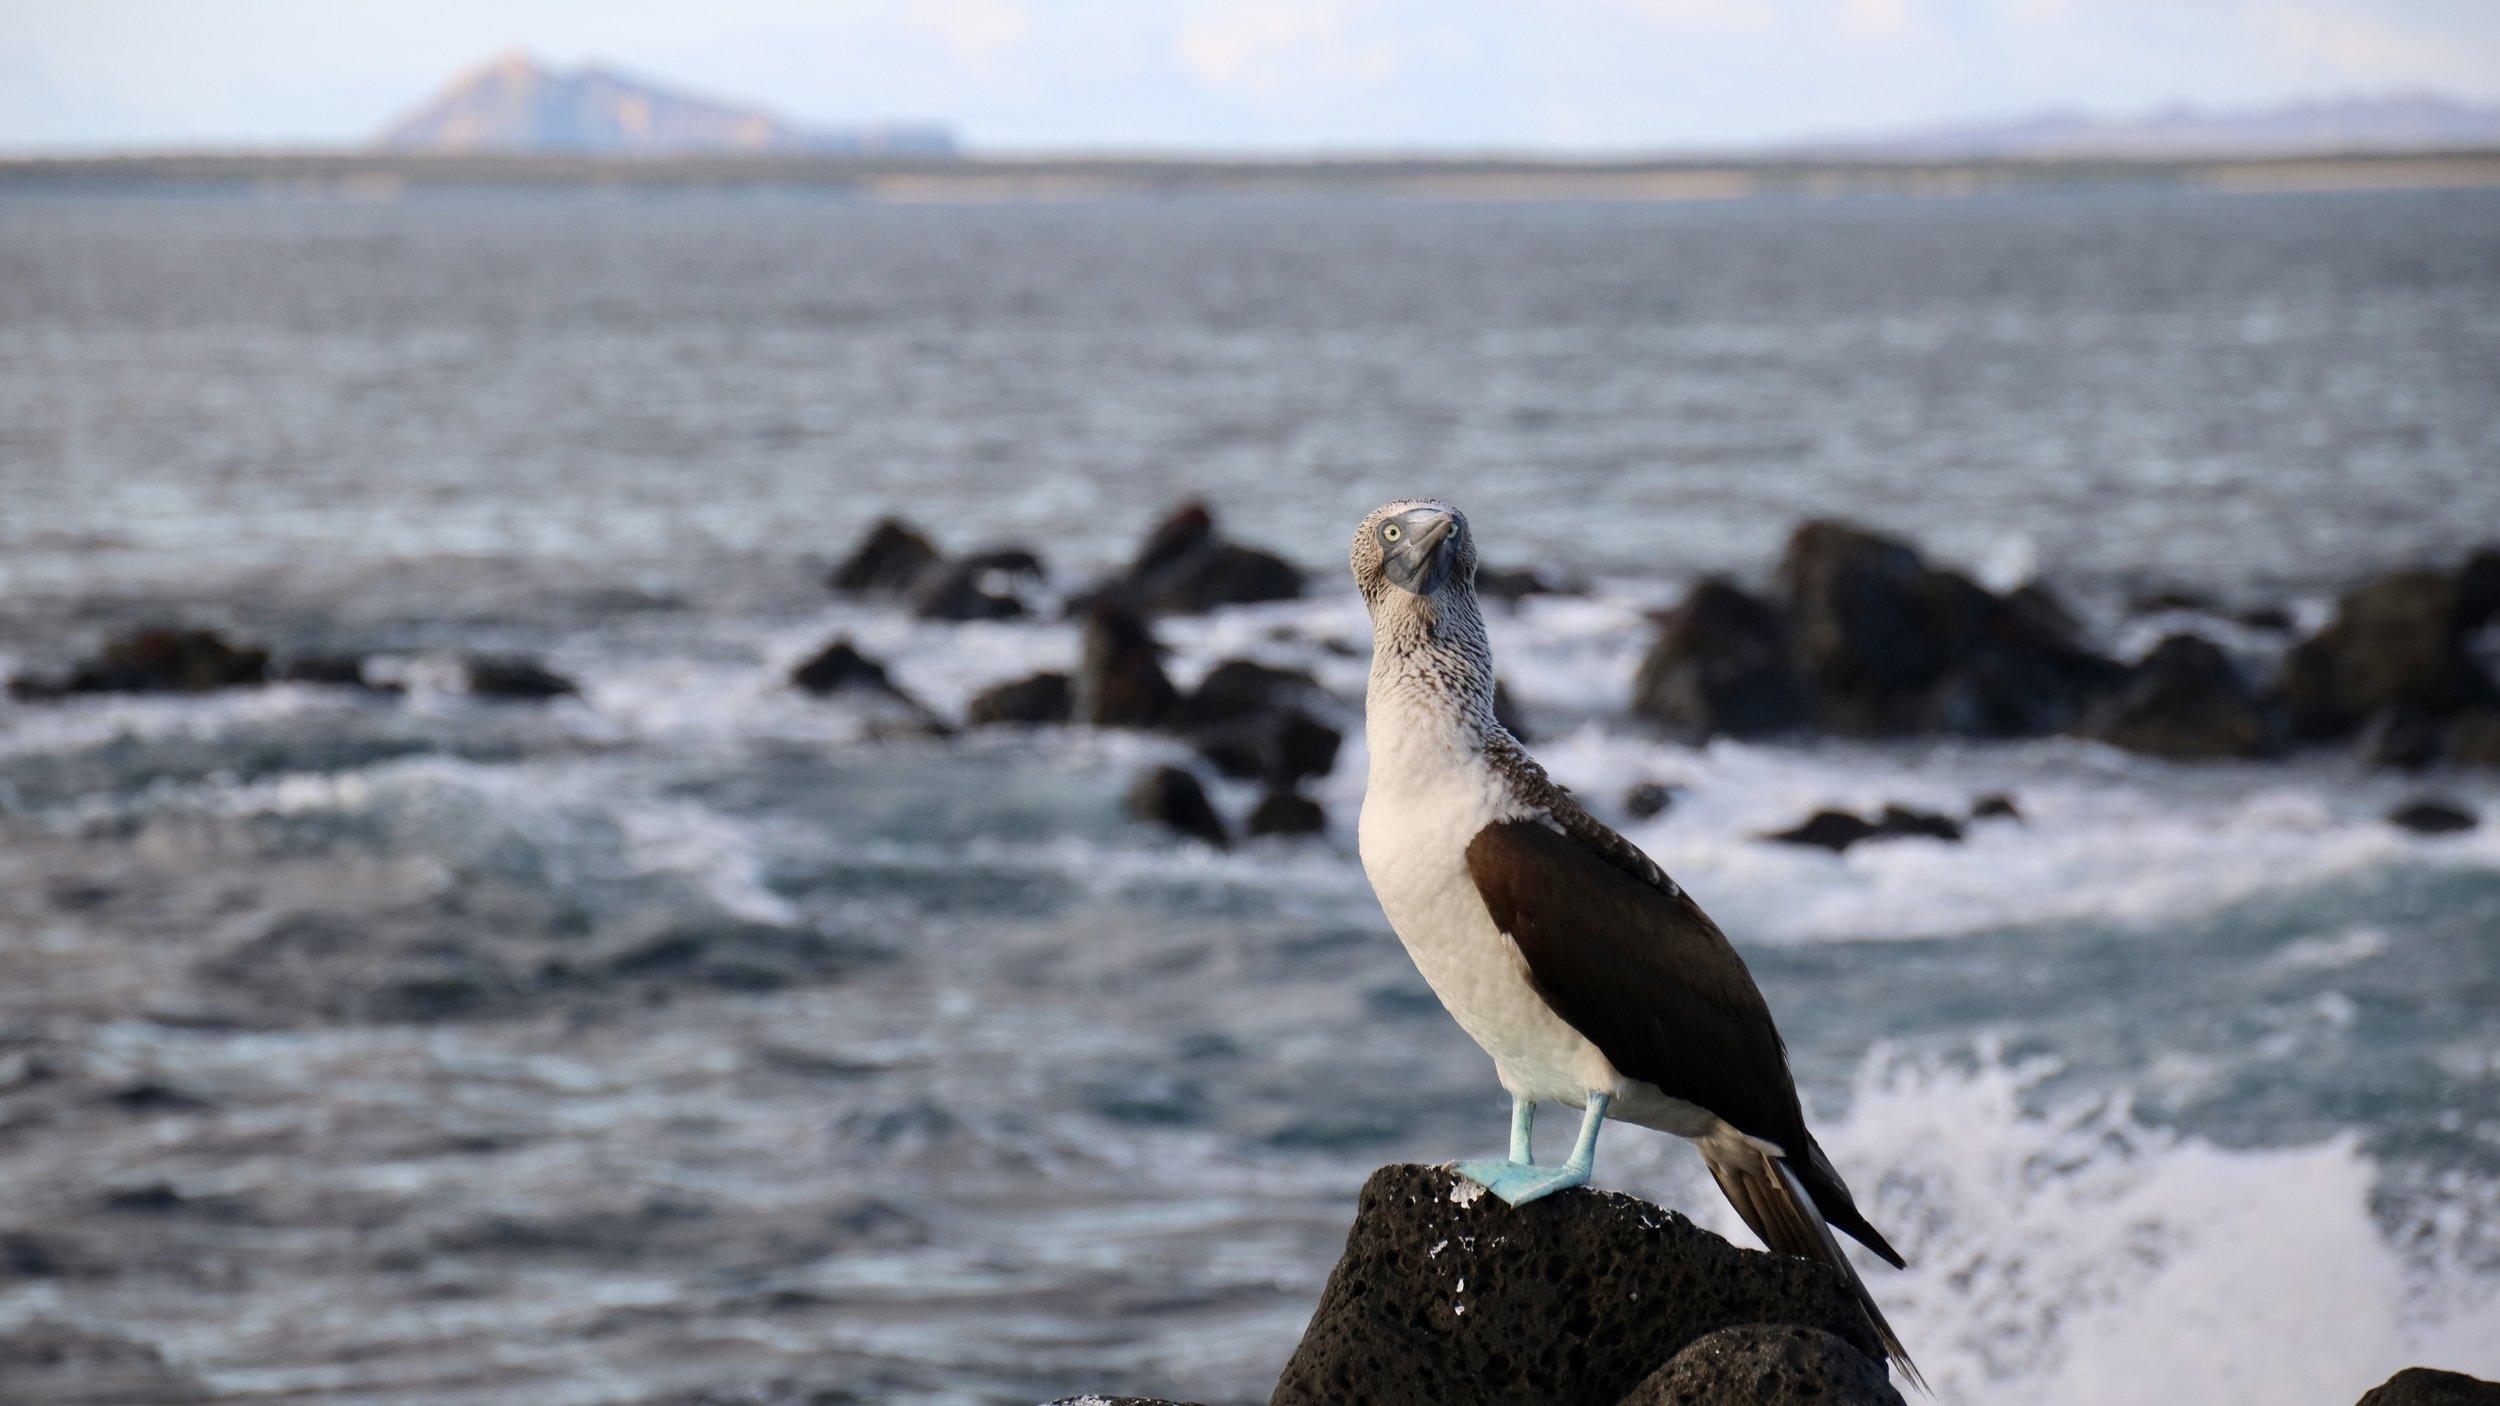 Blue-footed booby & Kicker Rock,Santa Fe Island